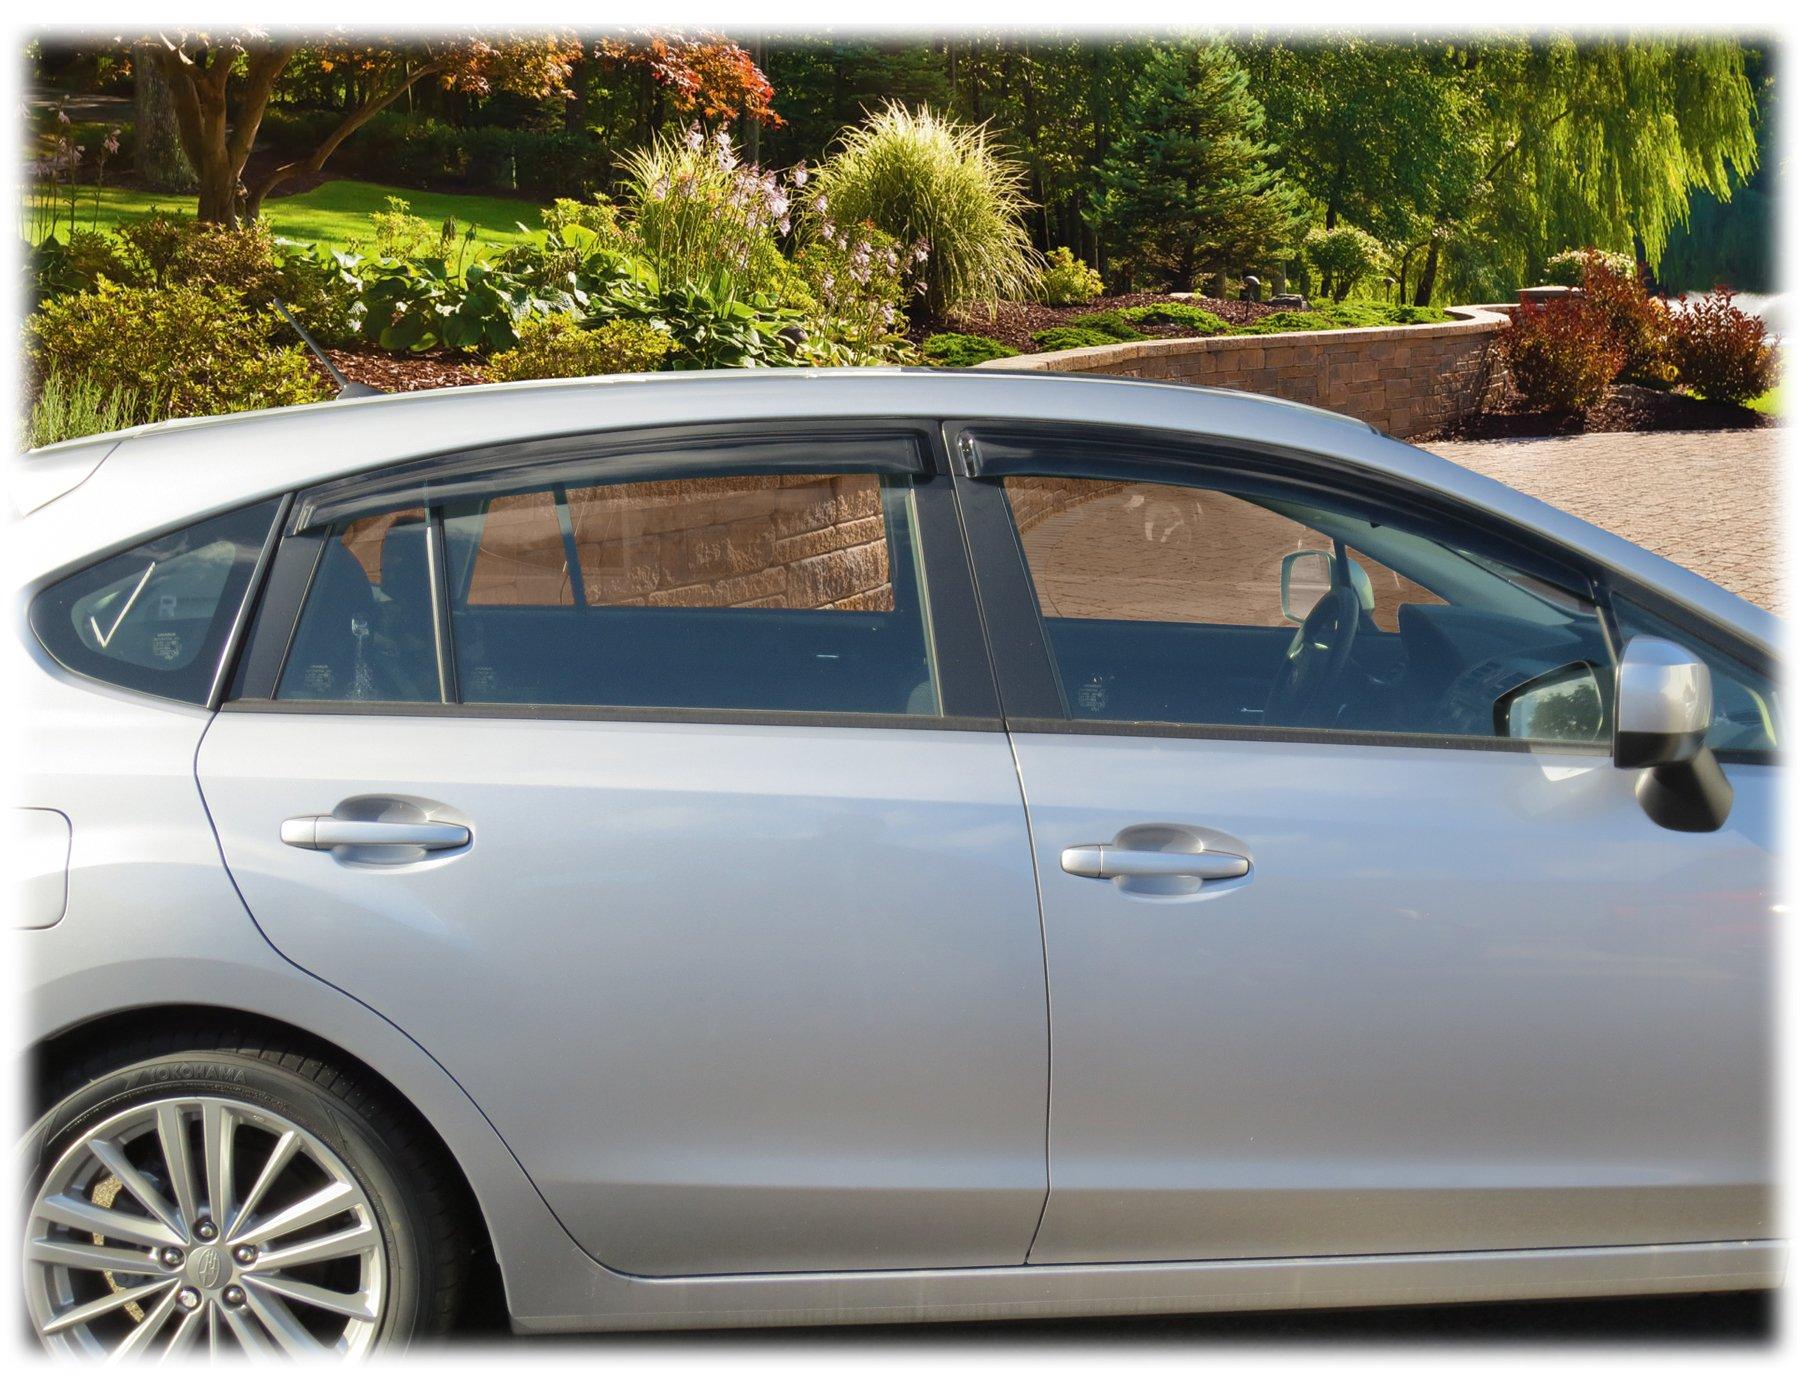 C&C Car Worx WV-12IH-TF Set of 4 Tape-On Window Visor Rain Guard Deflectors fit 2012-16 Subaru Impreza Hatchback (DO NOT FIT WRX or STI)